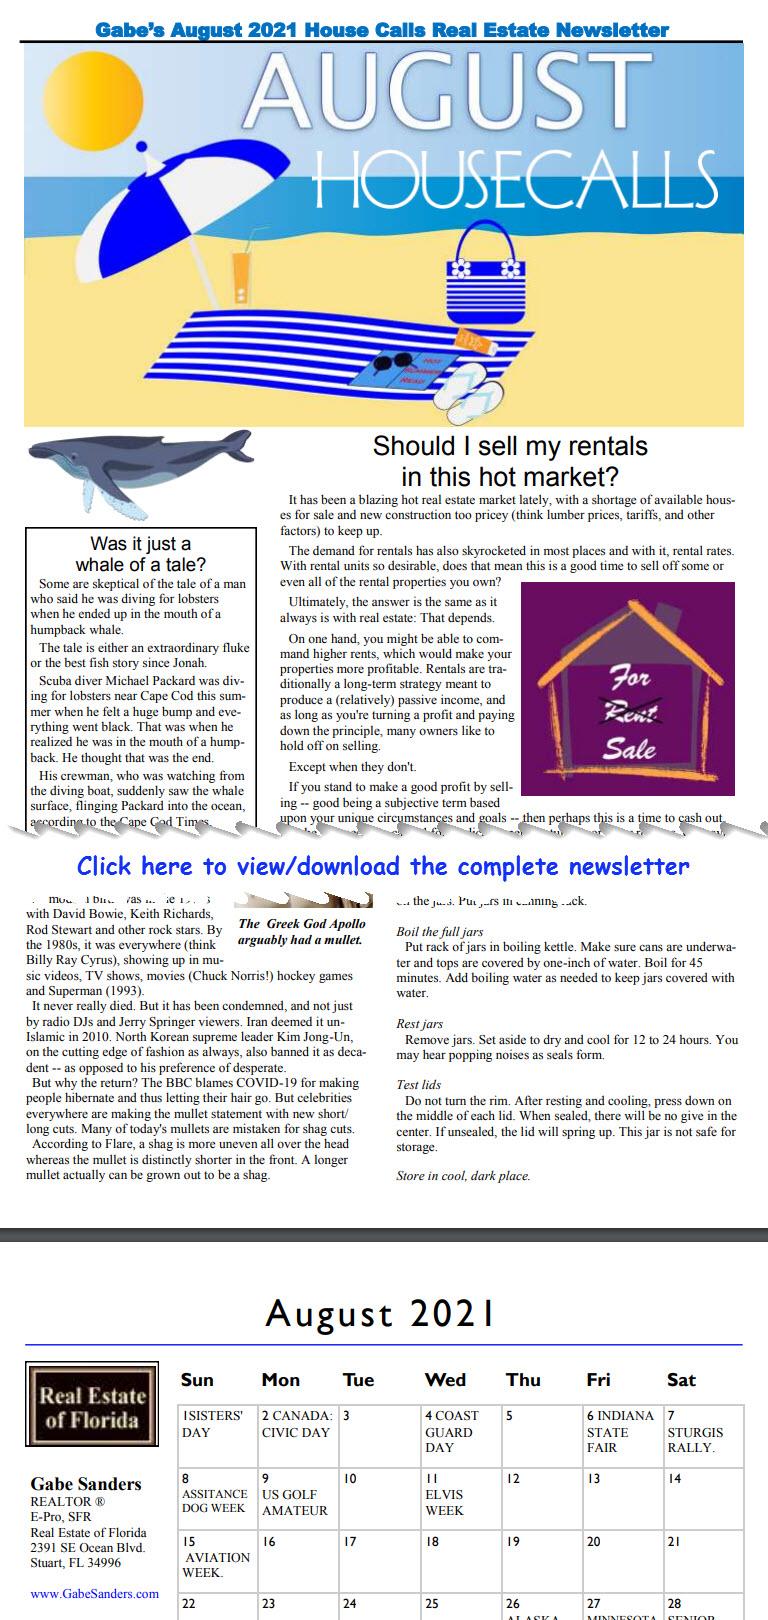 Gabe's August 2021 House Calls Real Estate Newsletter